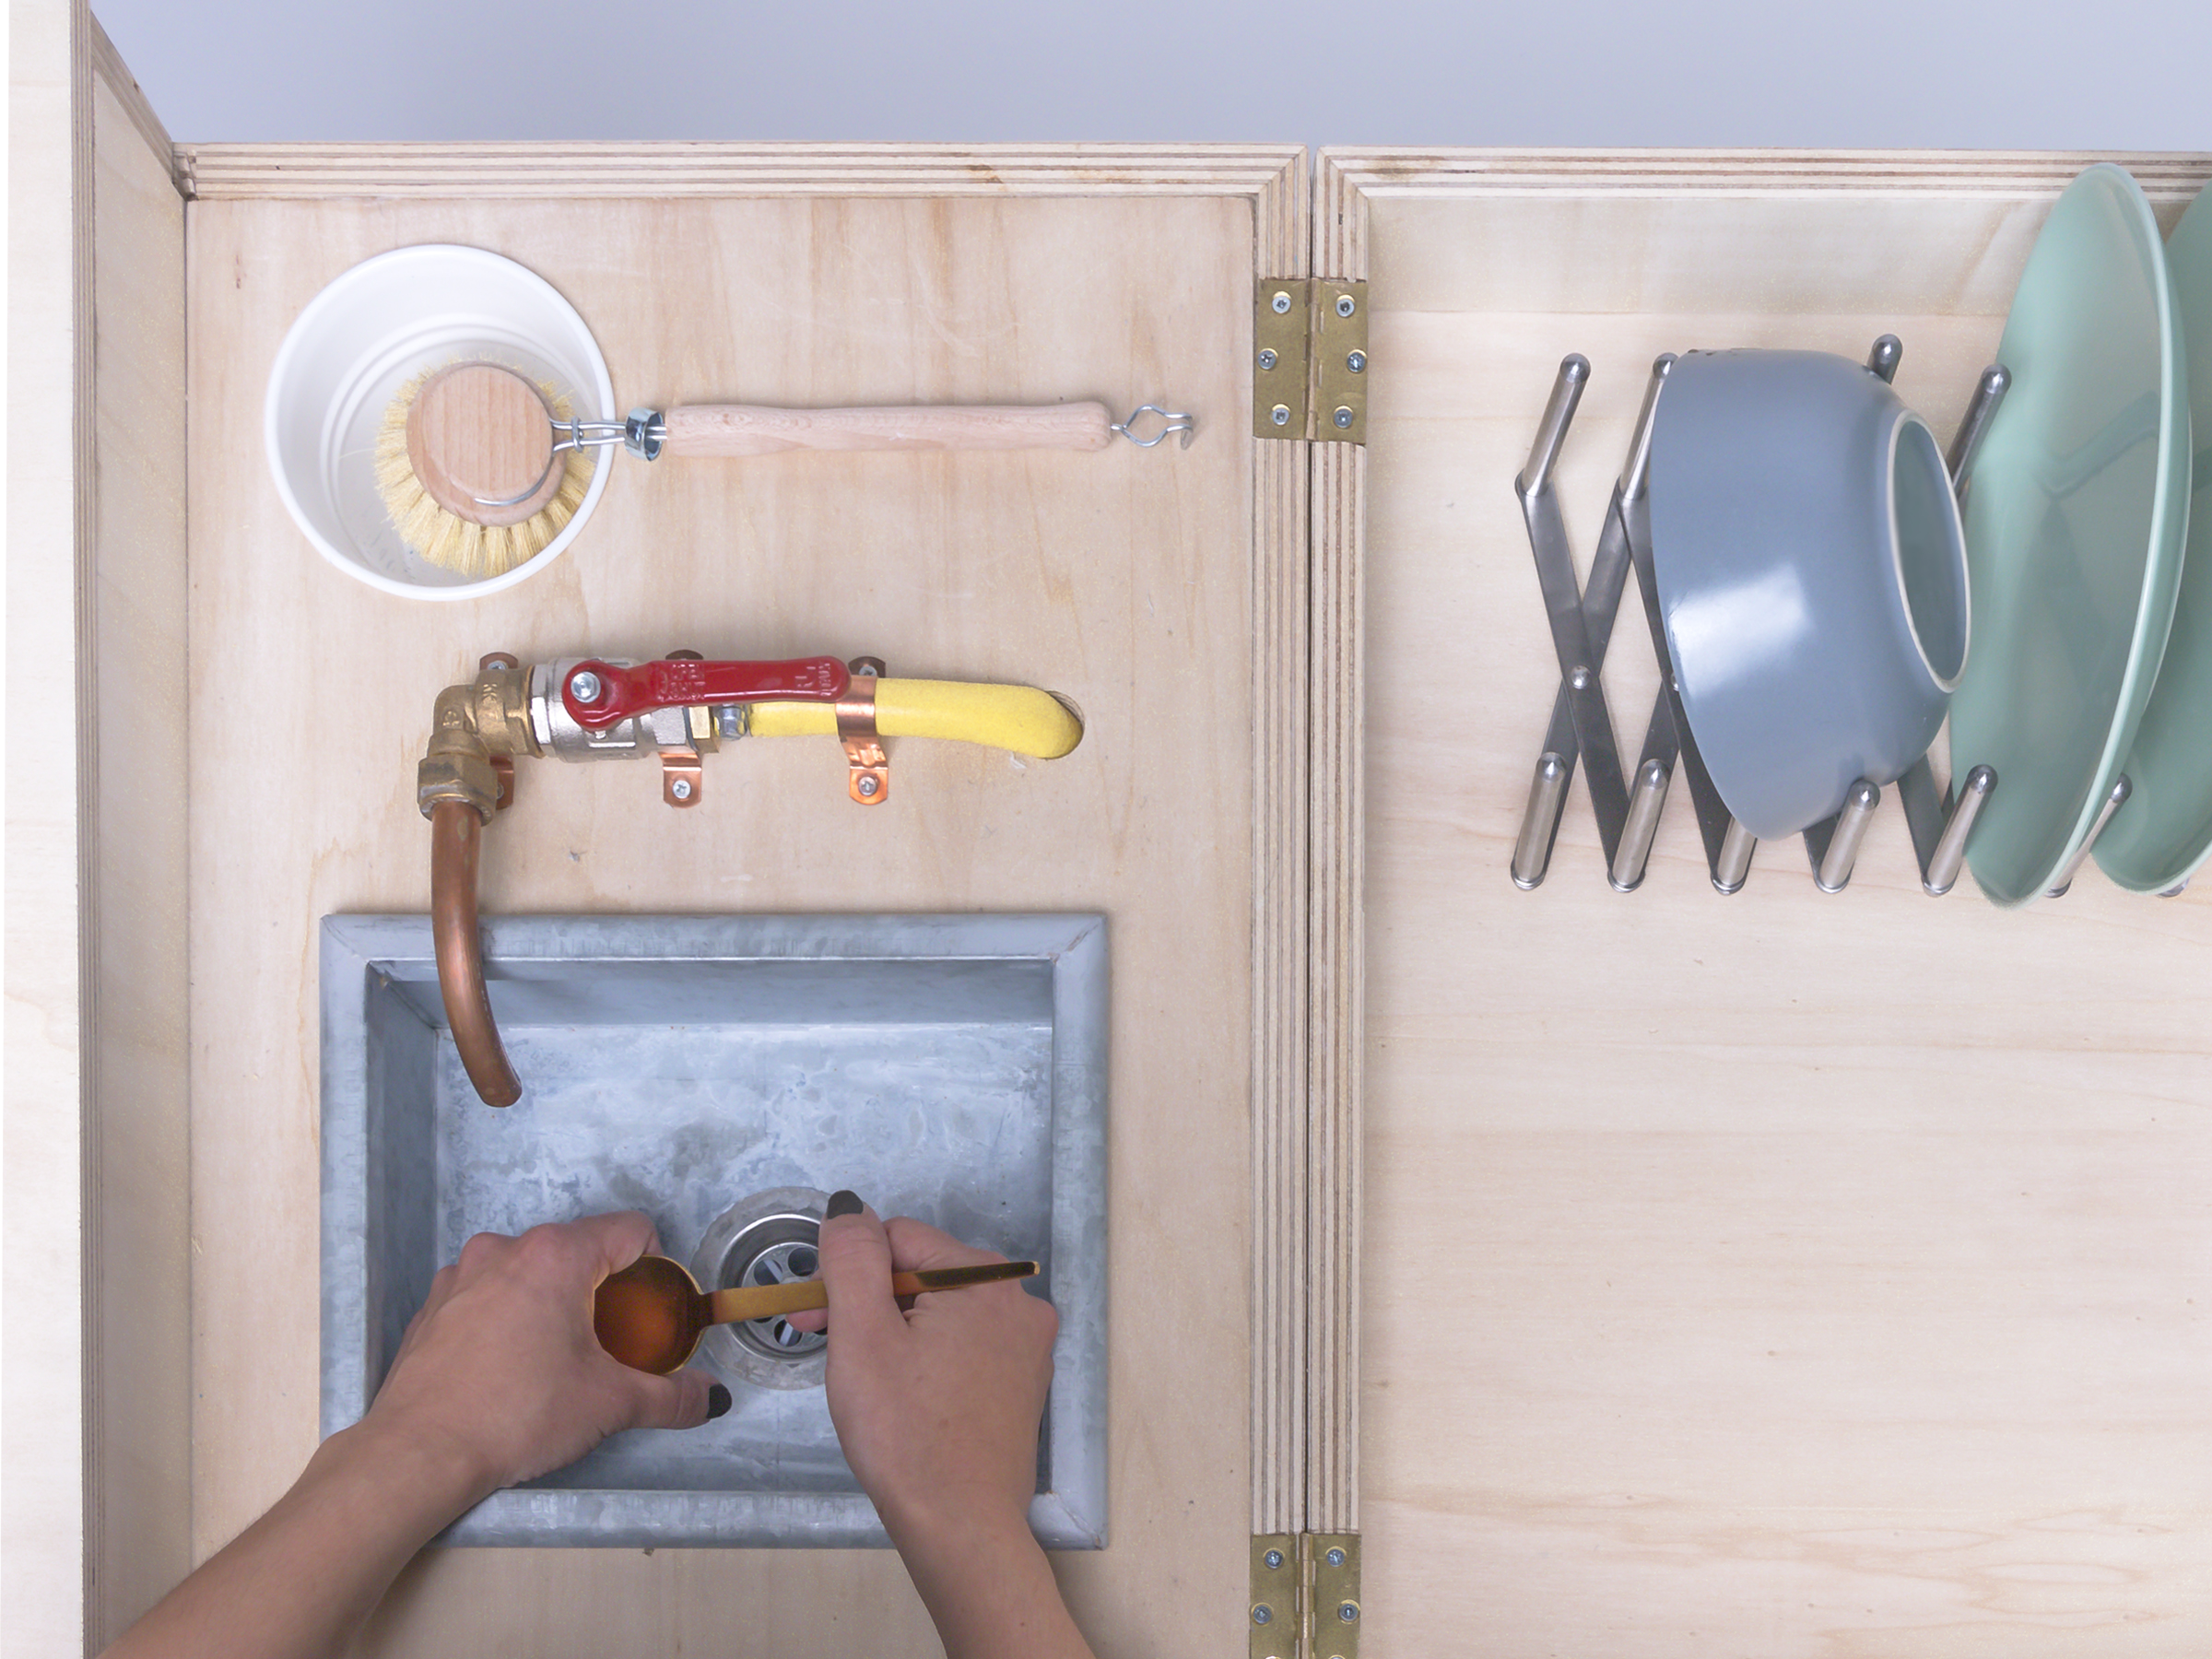 4-liberation-of-the-kitchen.jpg